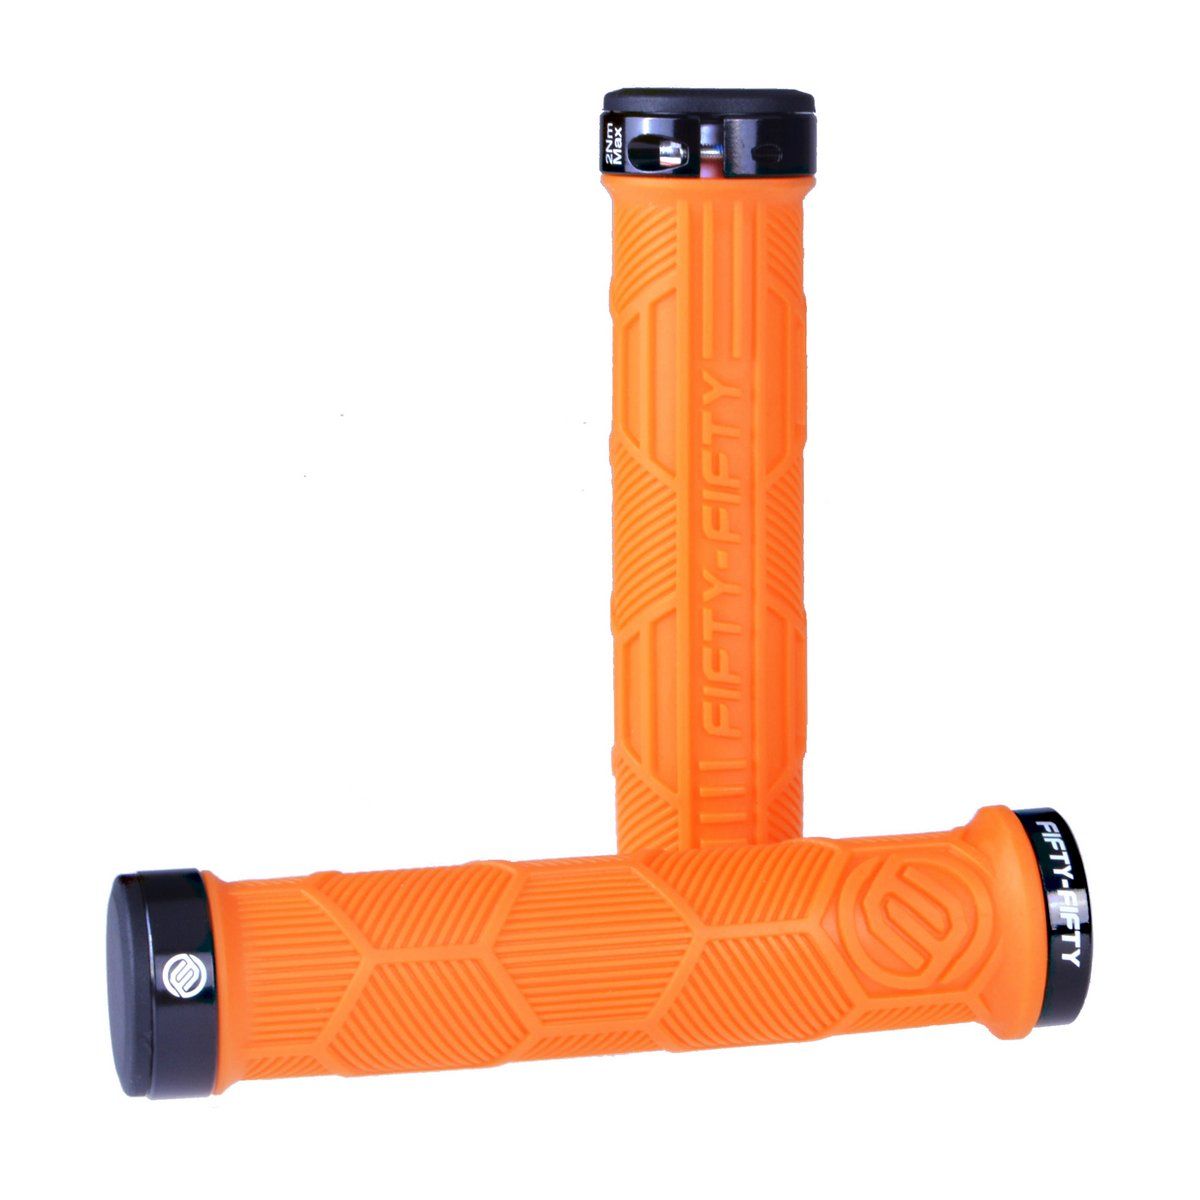 grip_orange DUAL LOCK-ON GRIPS